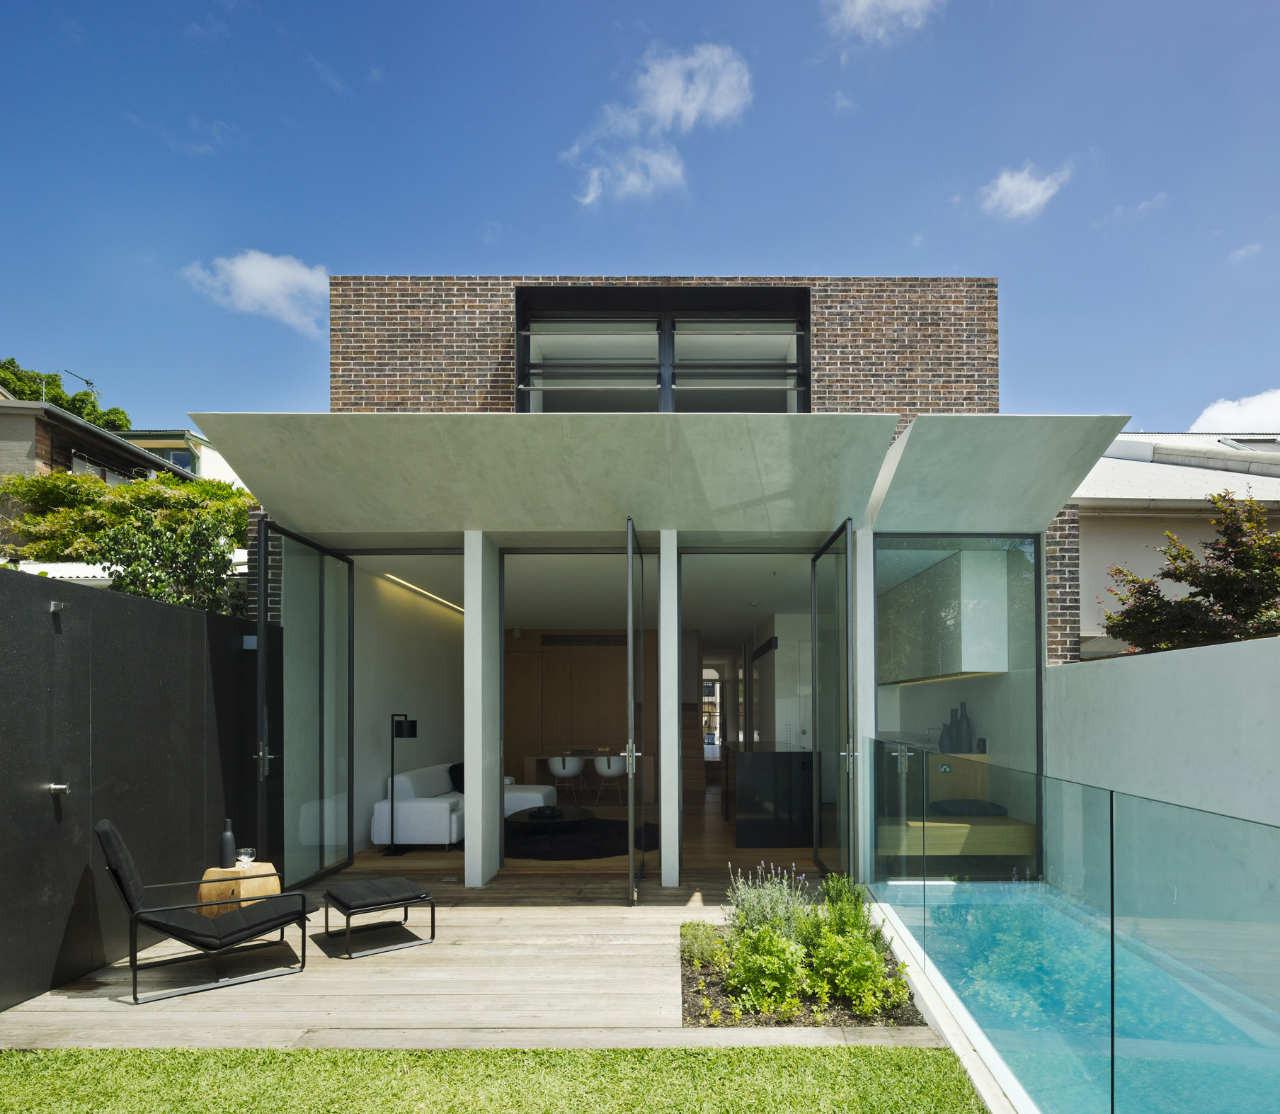 Paddington House / Nobbs Radford Architects, © Peter Bennetts